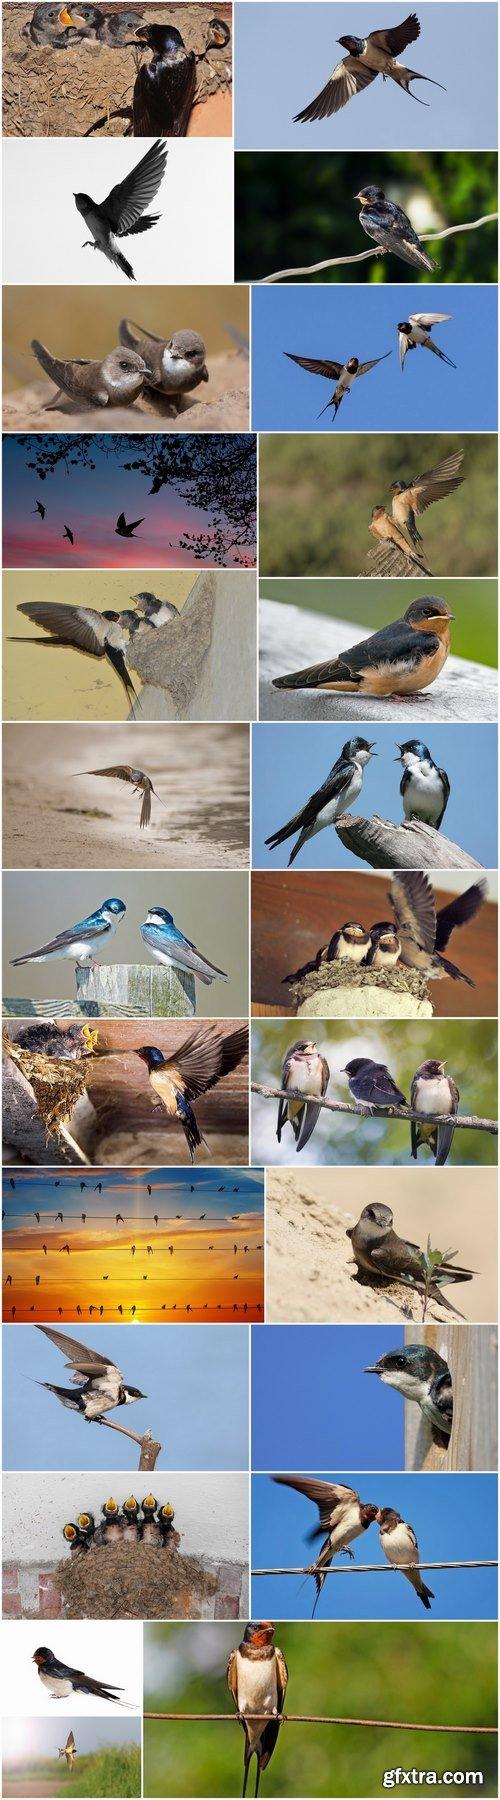 Swallow bird flight wing feather nestling nest 25 HQ Jpeg